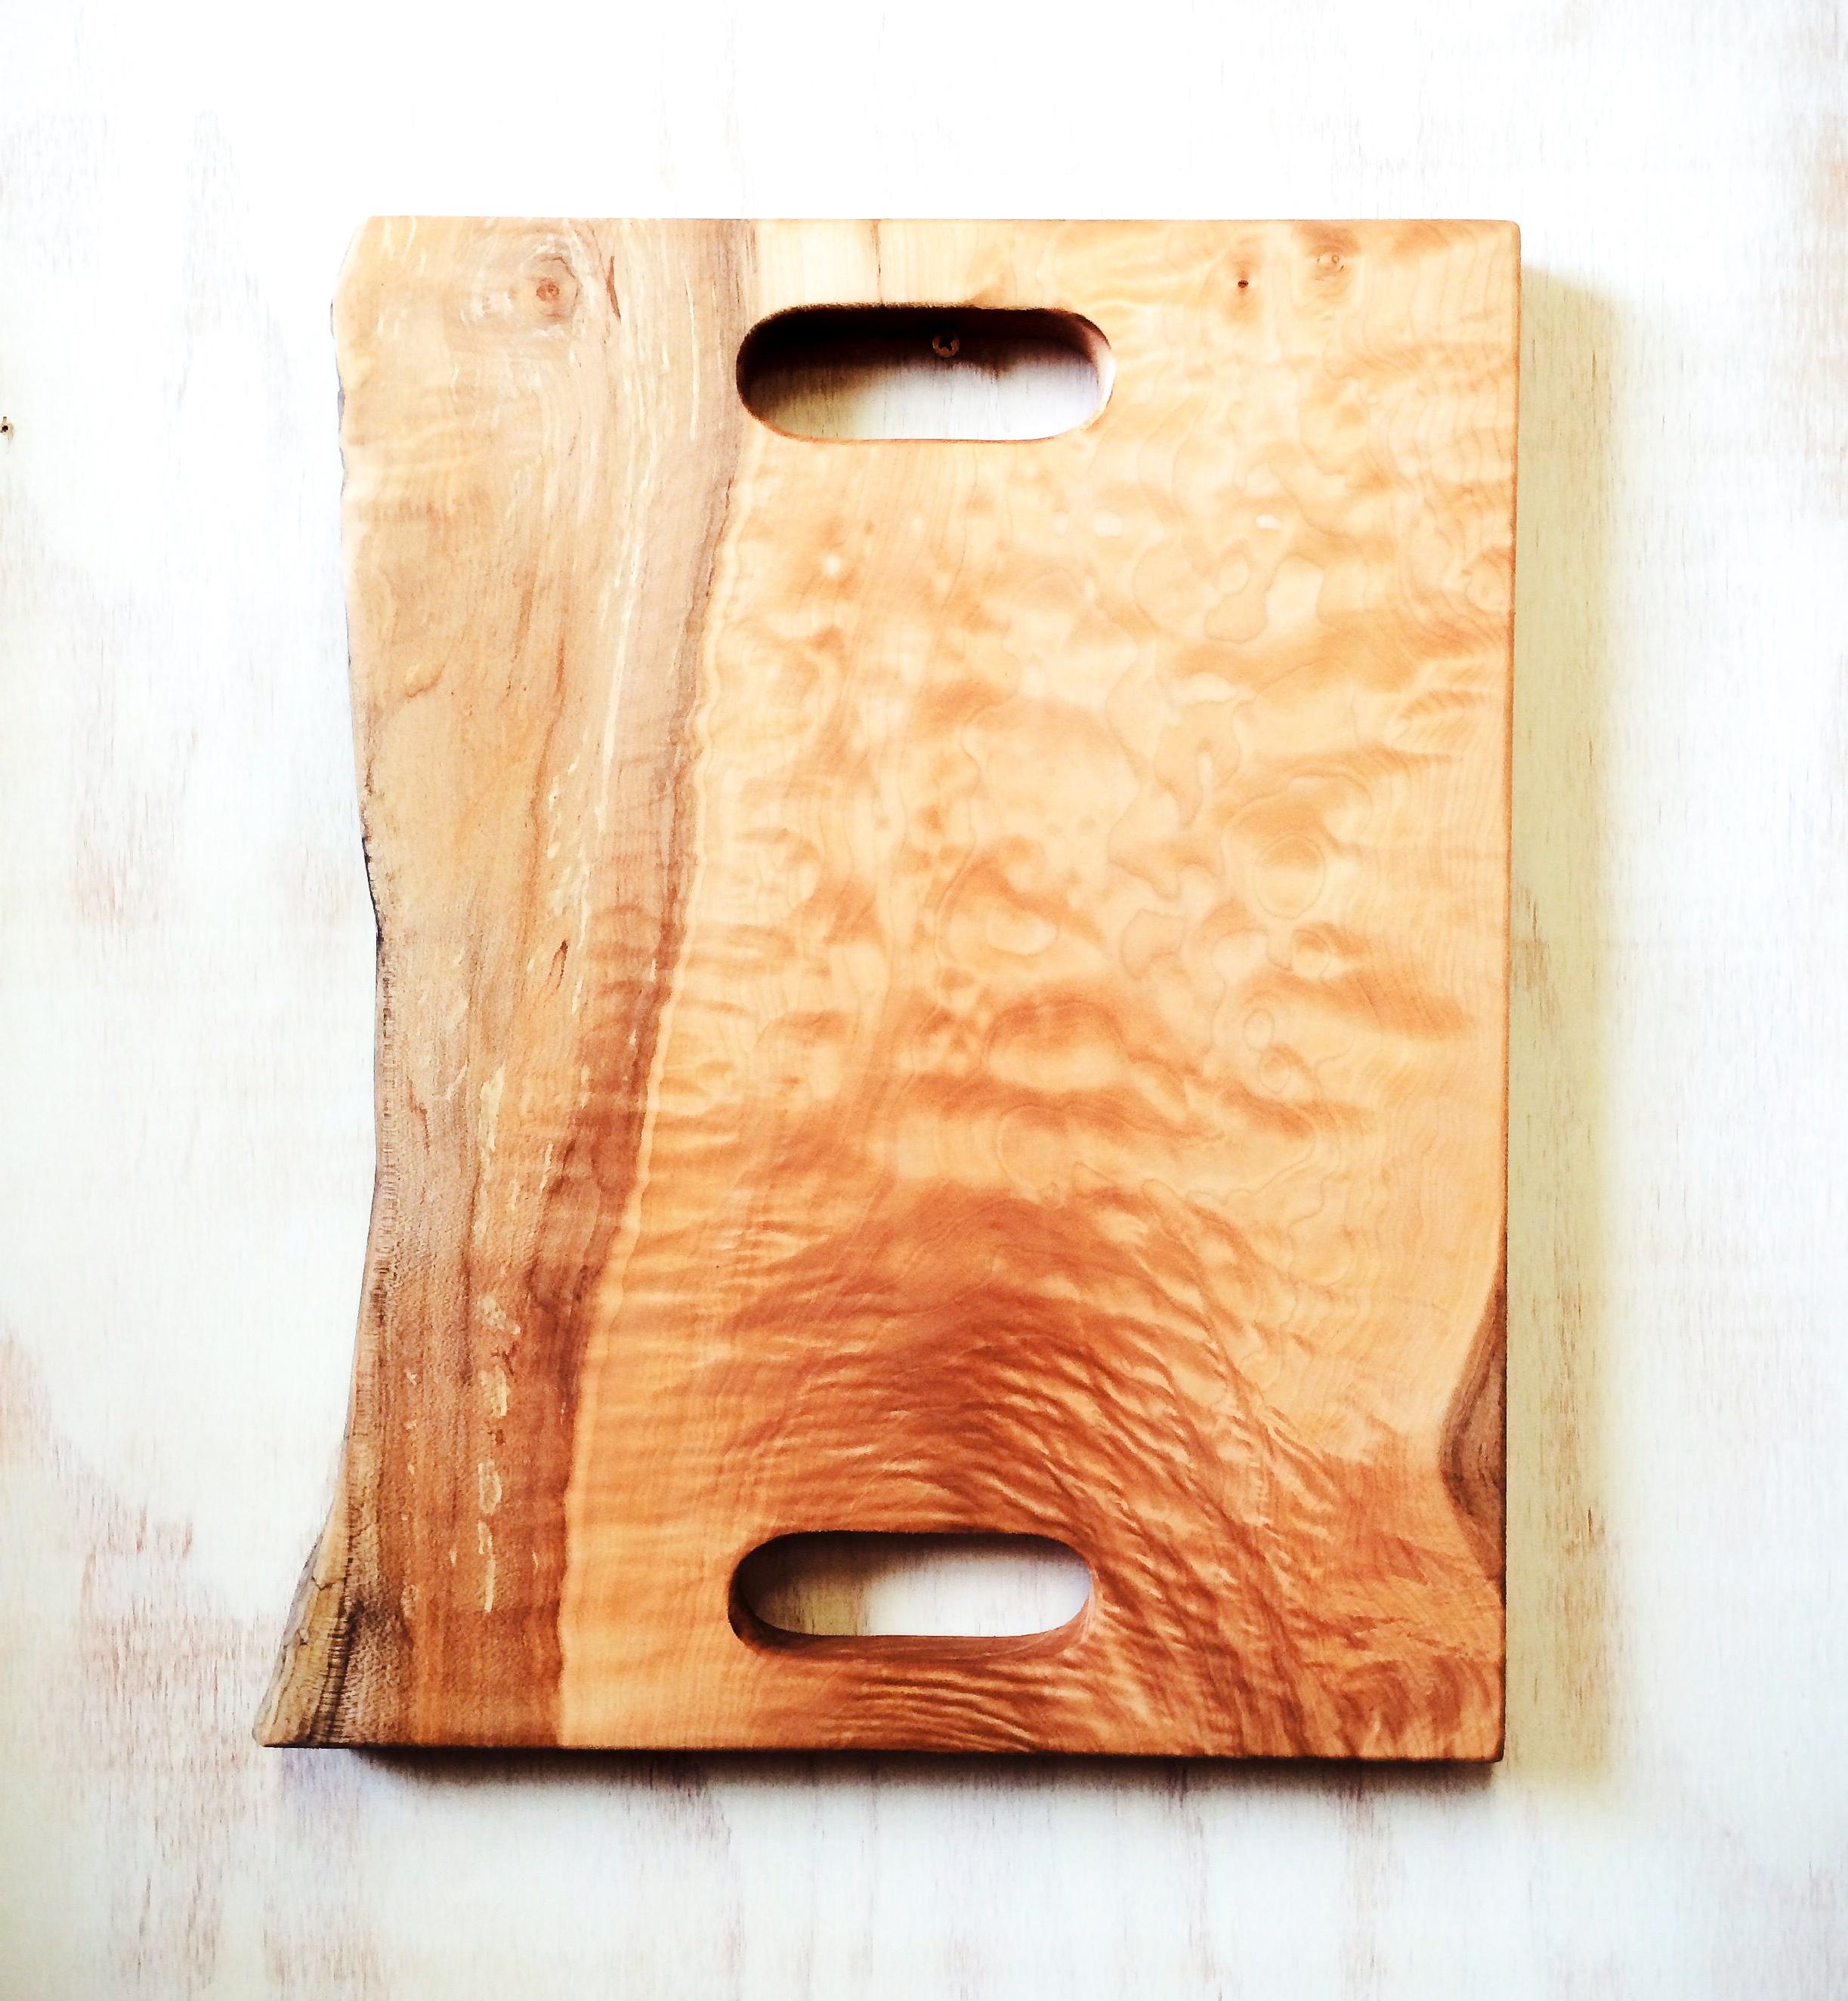 CuttingBoard17.jpg